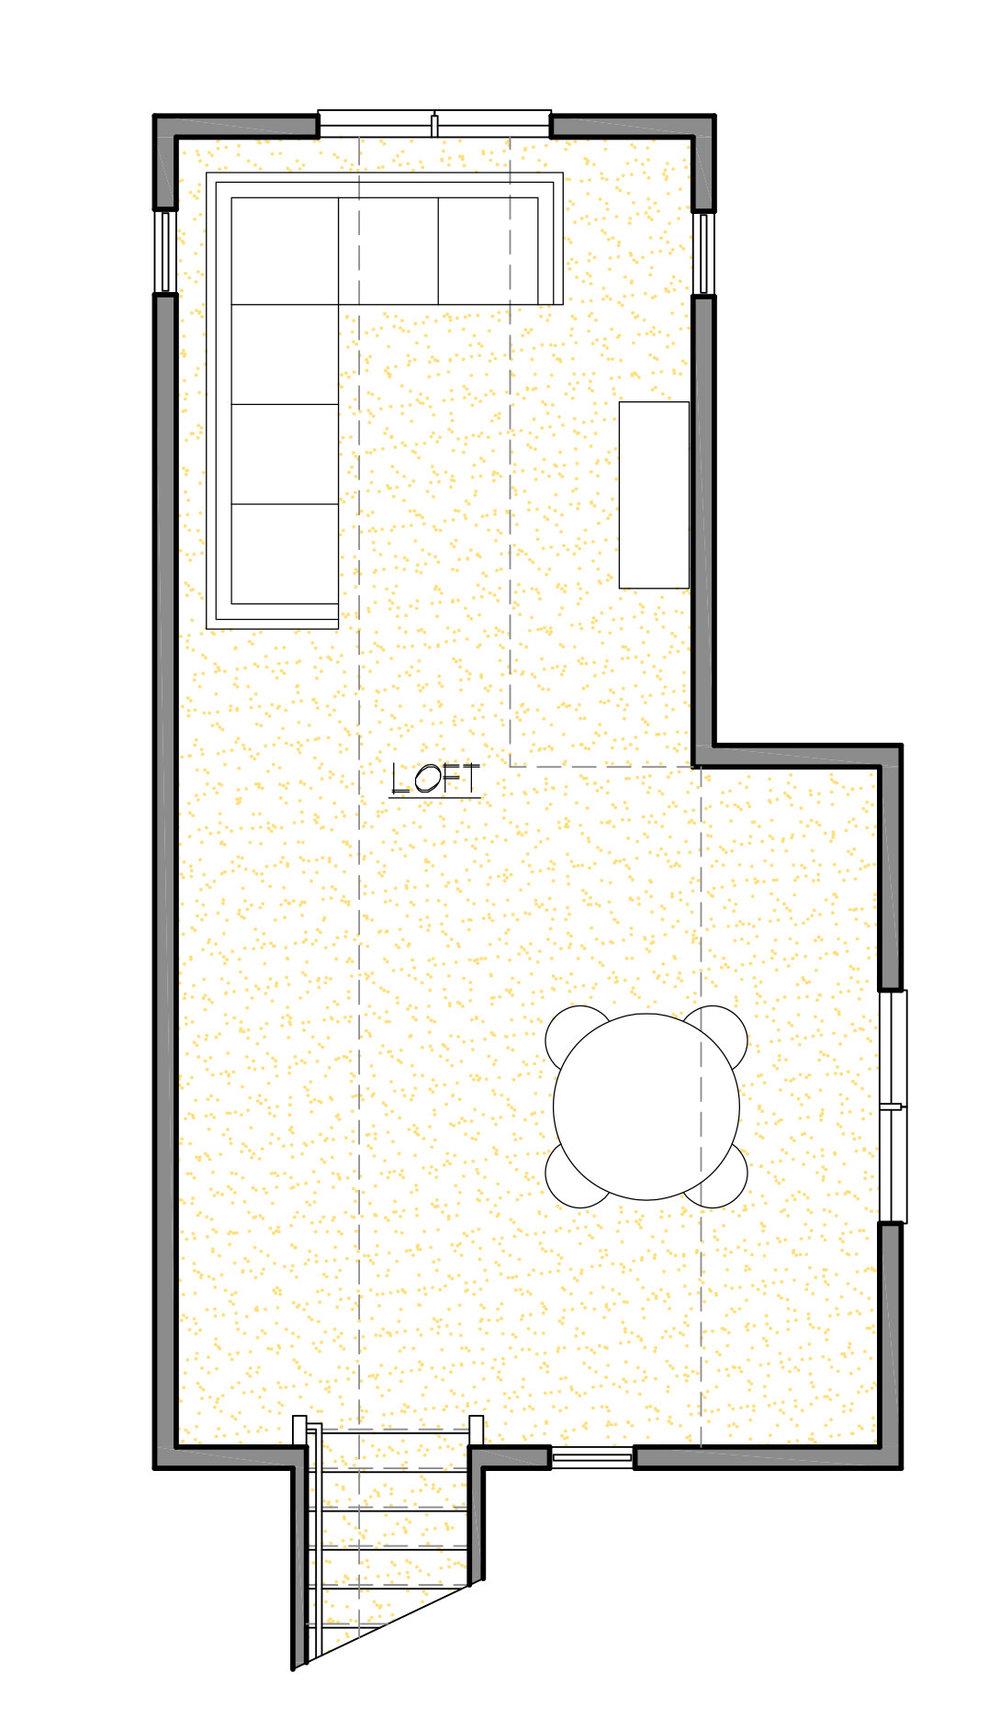 HP-6-Loft-plan-Crop.jpg